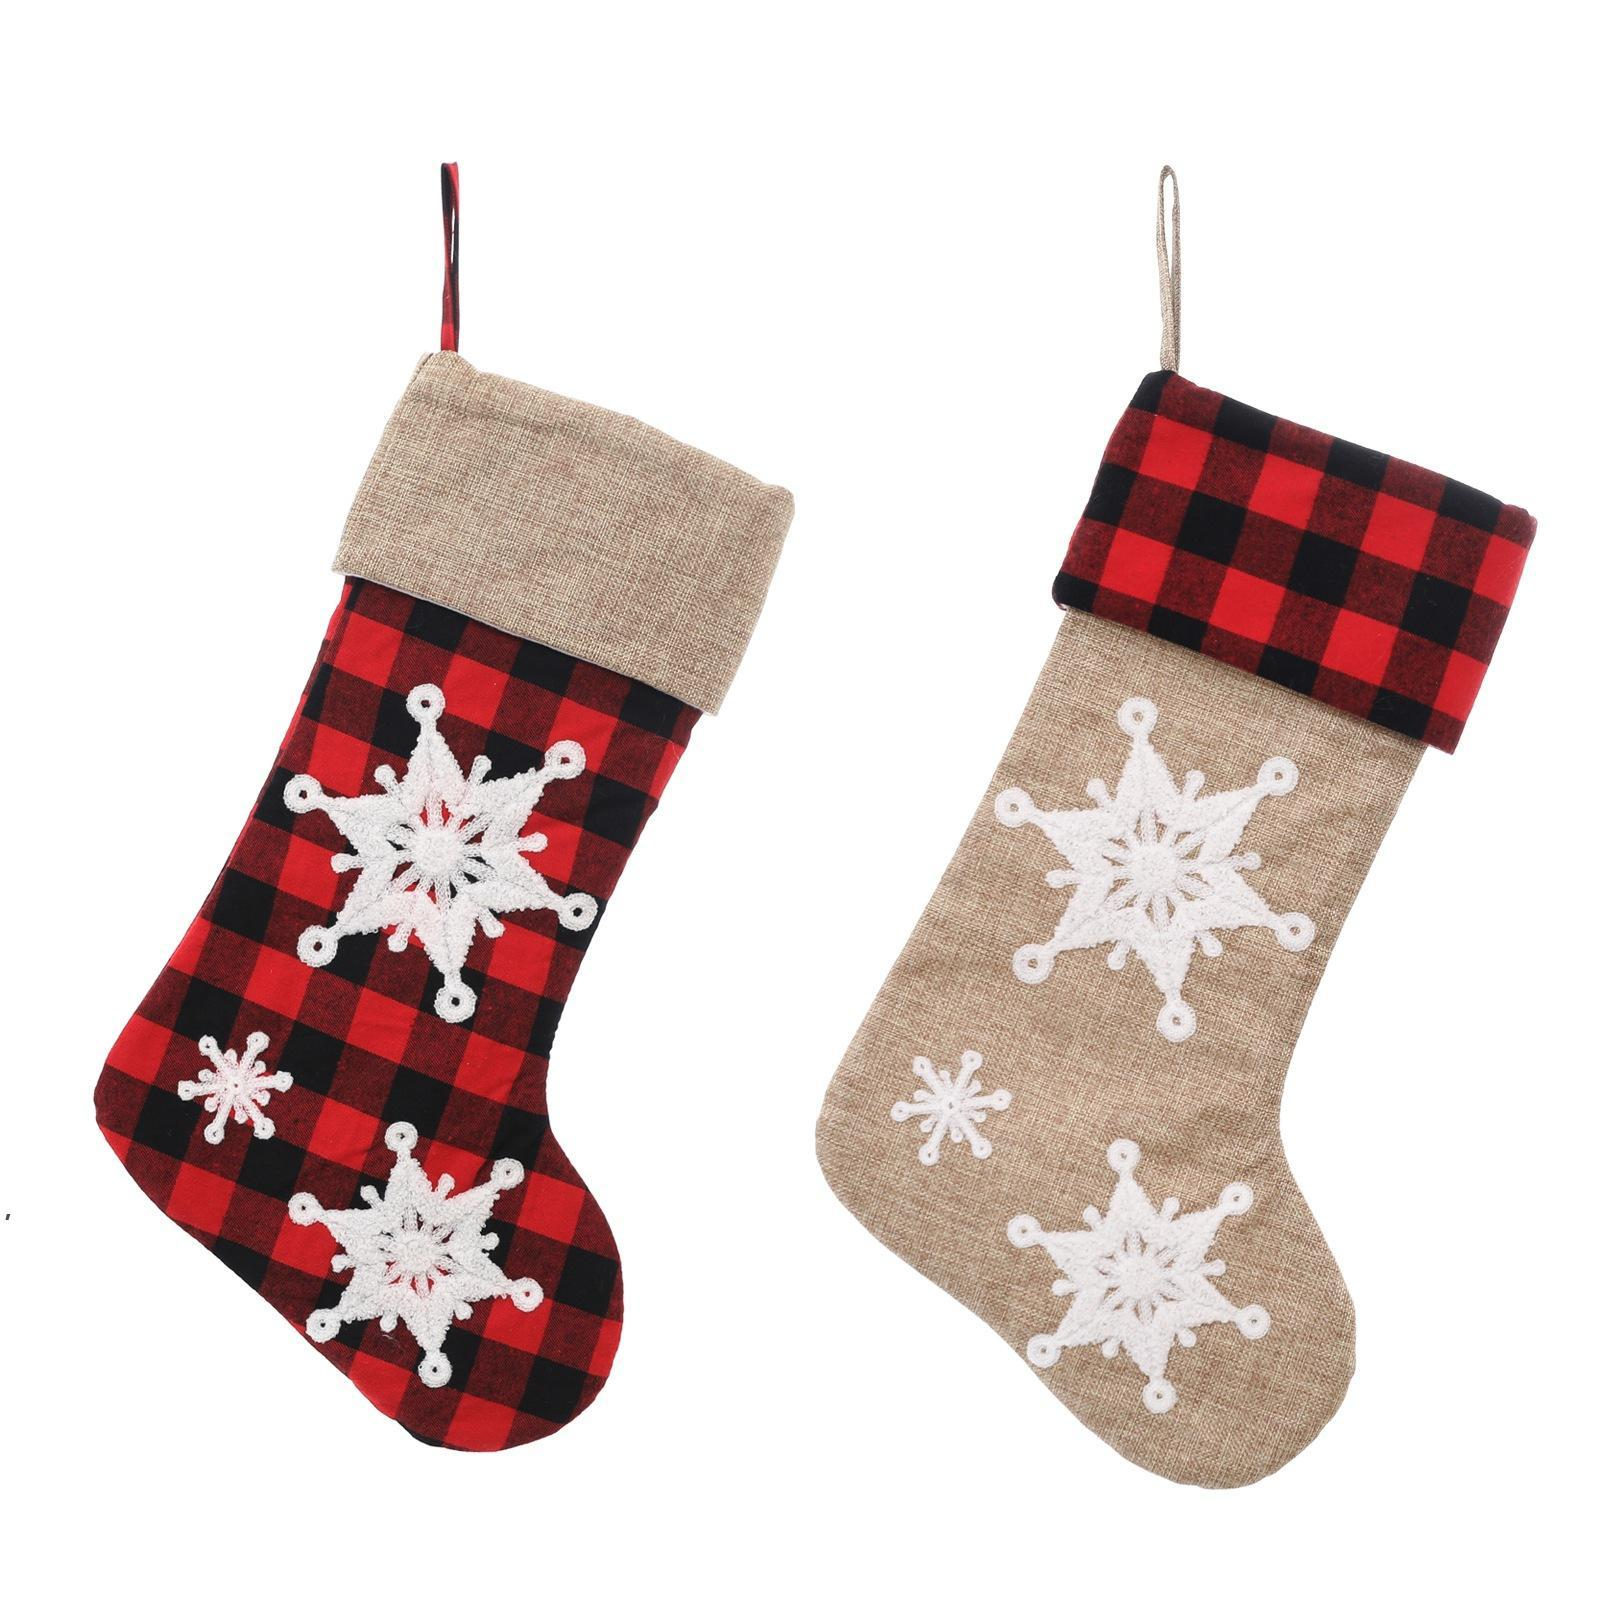 3D copo de nieve medias navideñas medias de Navidad árbol colgando adornos adornos chimenea gingham calcetines caramelo bolsa de regalo CCF8831